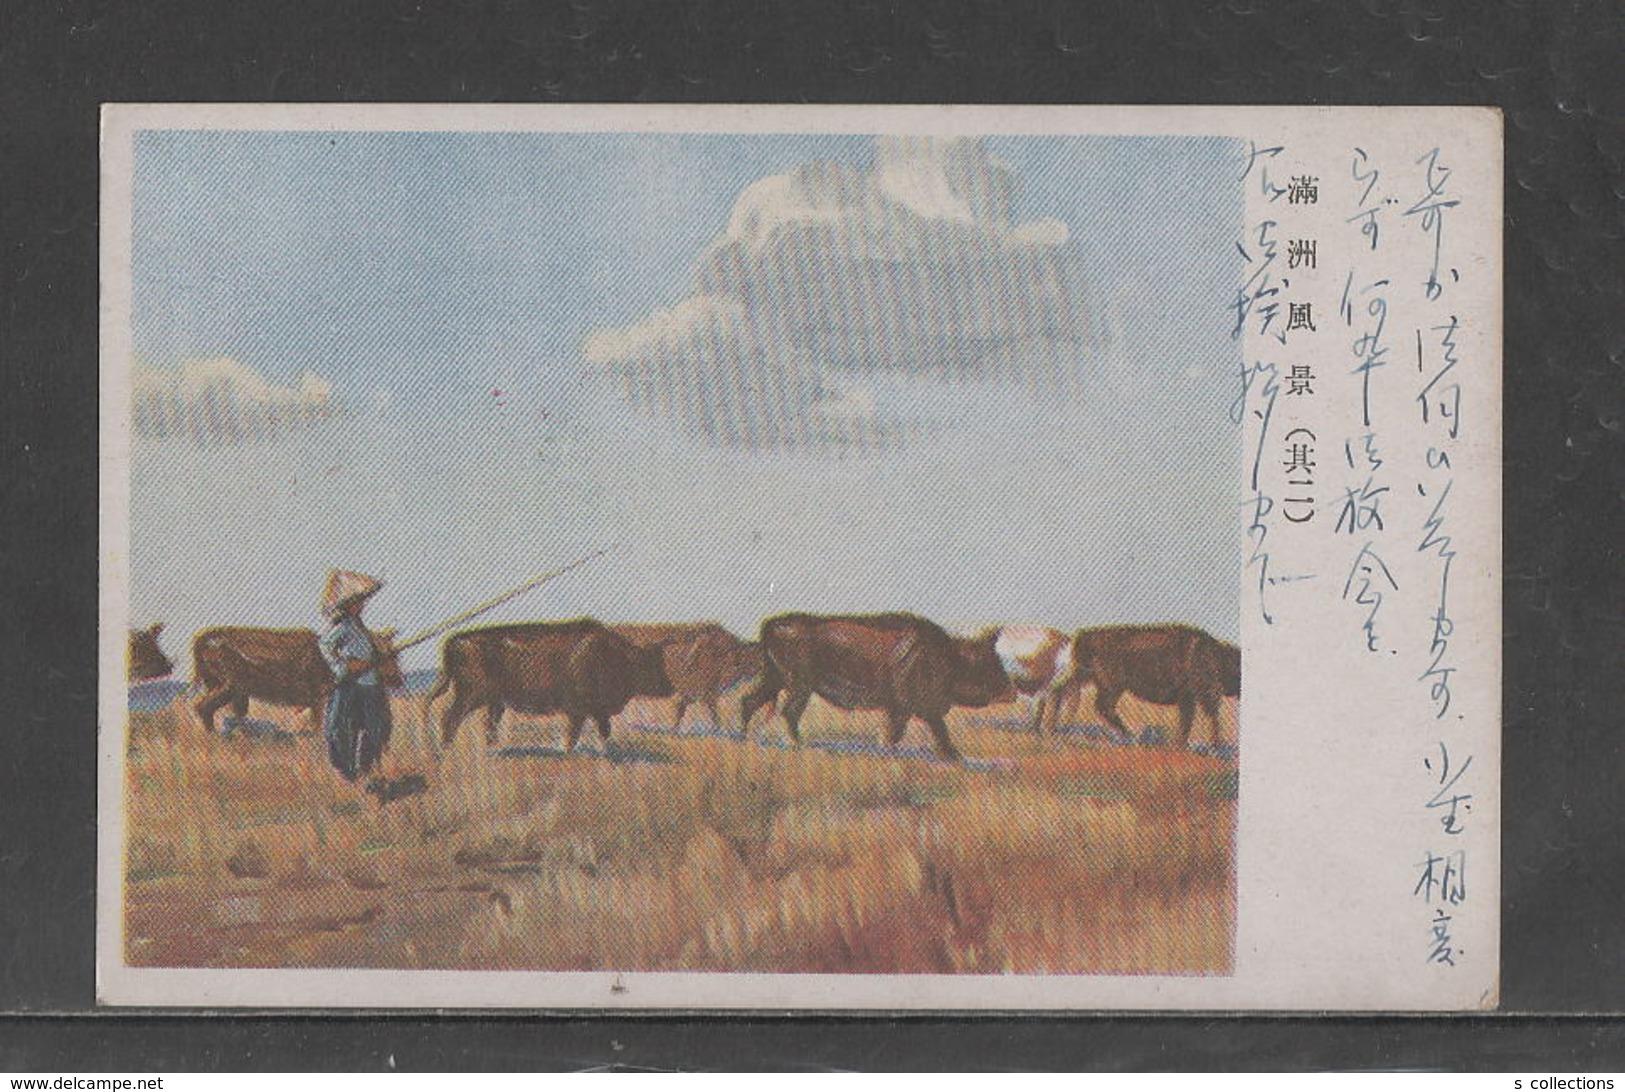 193245 manchuria manchukuo japan wwii military